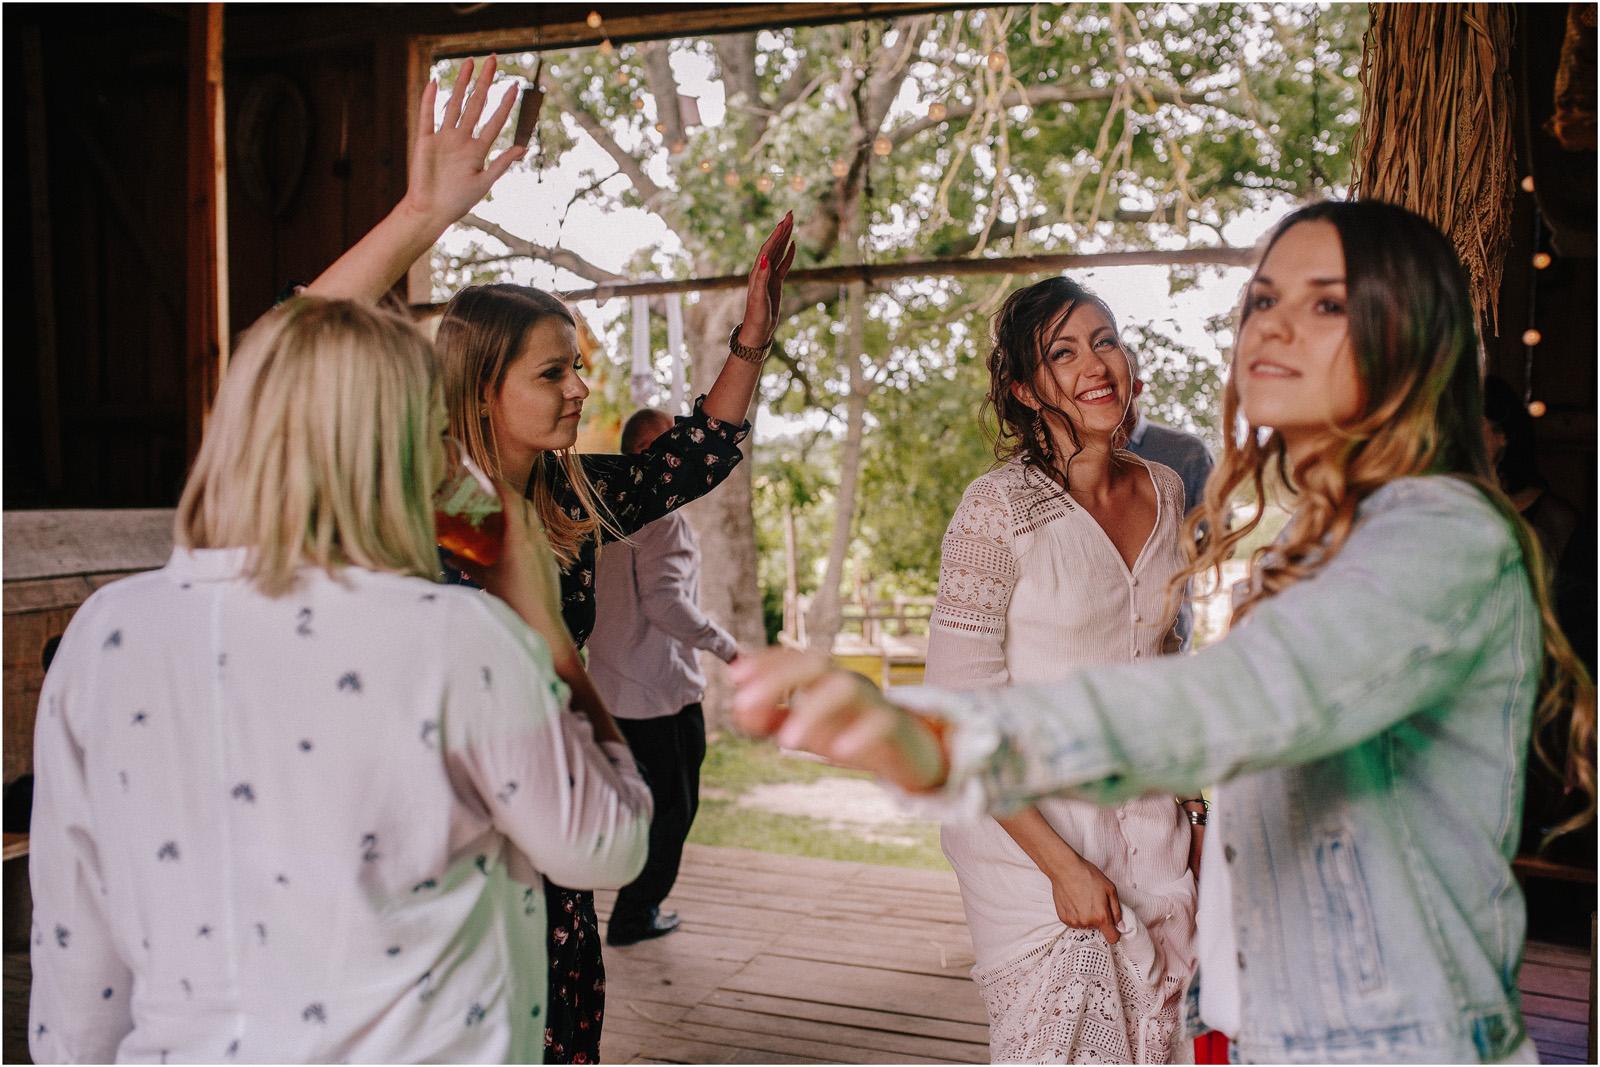 Agatka & Mati | garden party i impreza w stodole 44